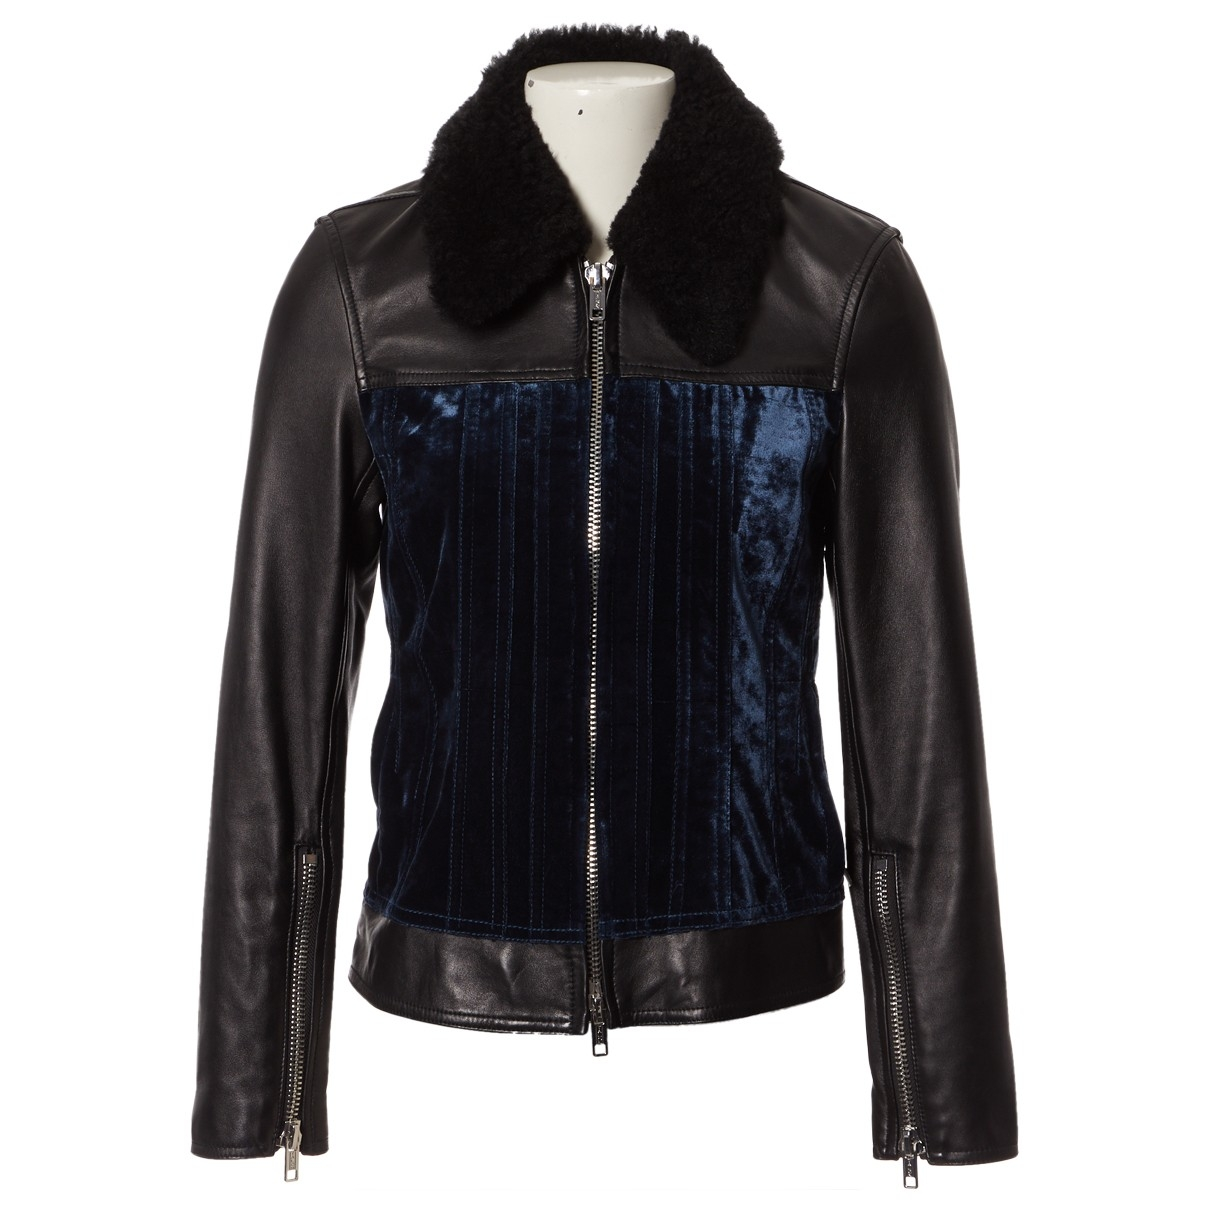 3.1 Phillip Lim \N Black Leather jacket for Women 2 US